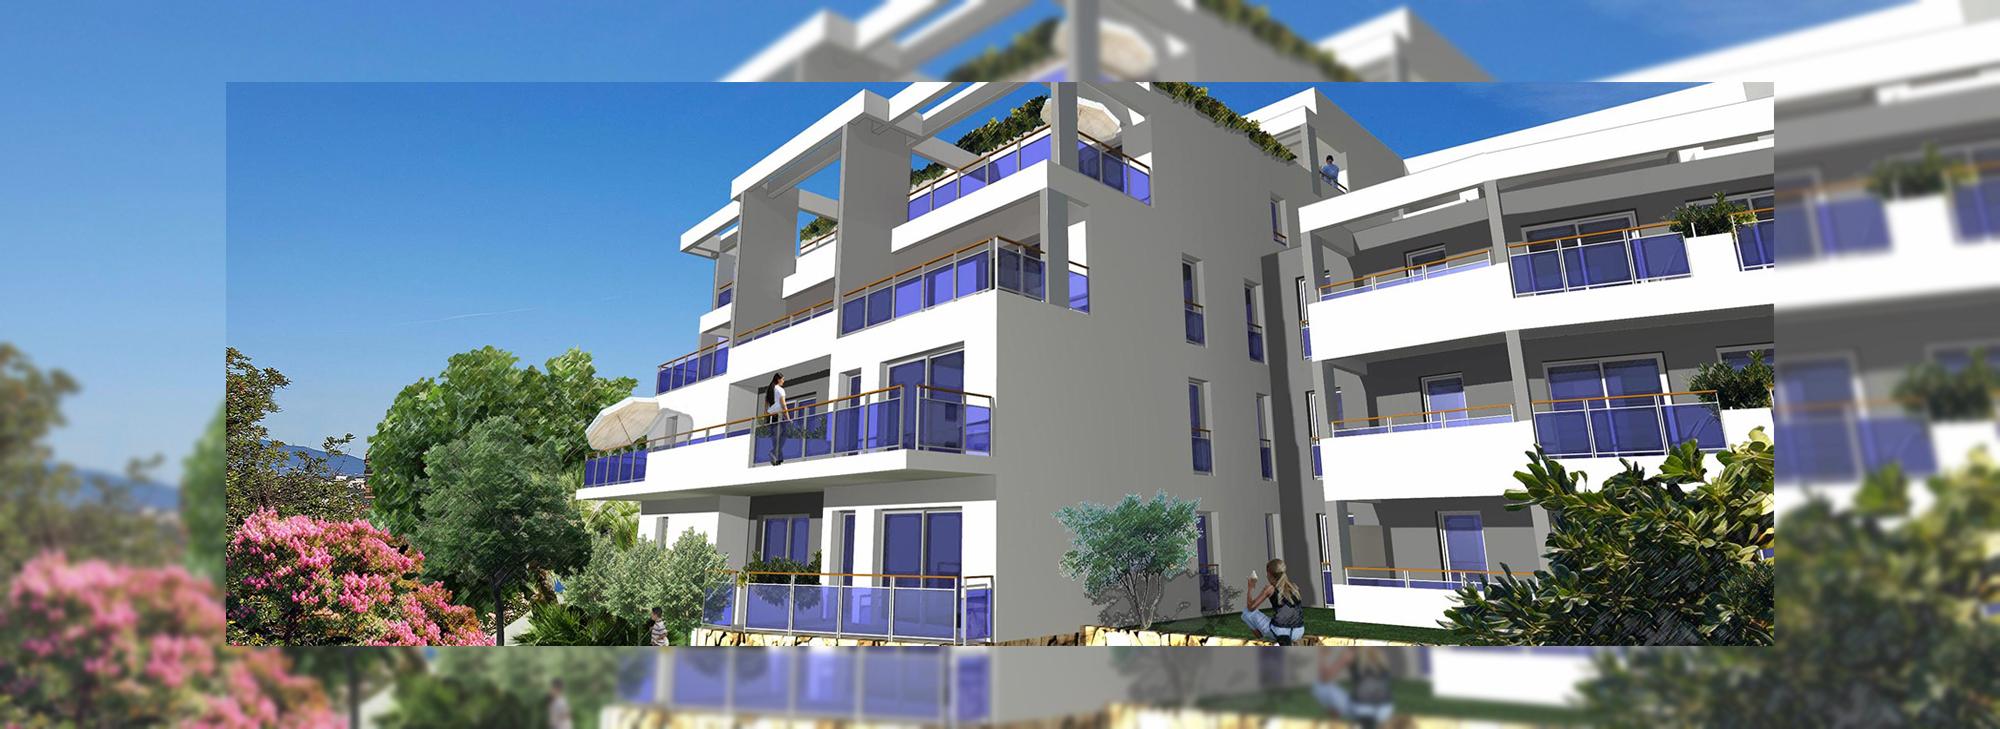 Architecte Nice